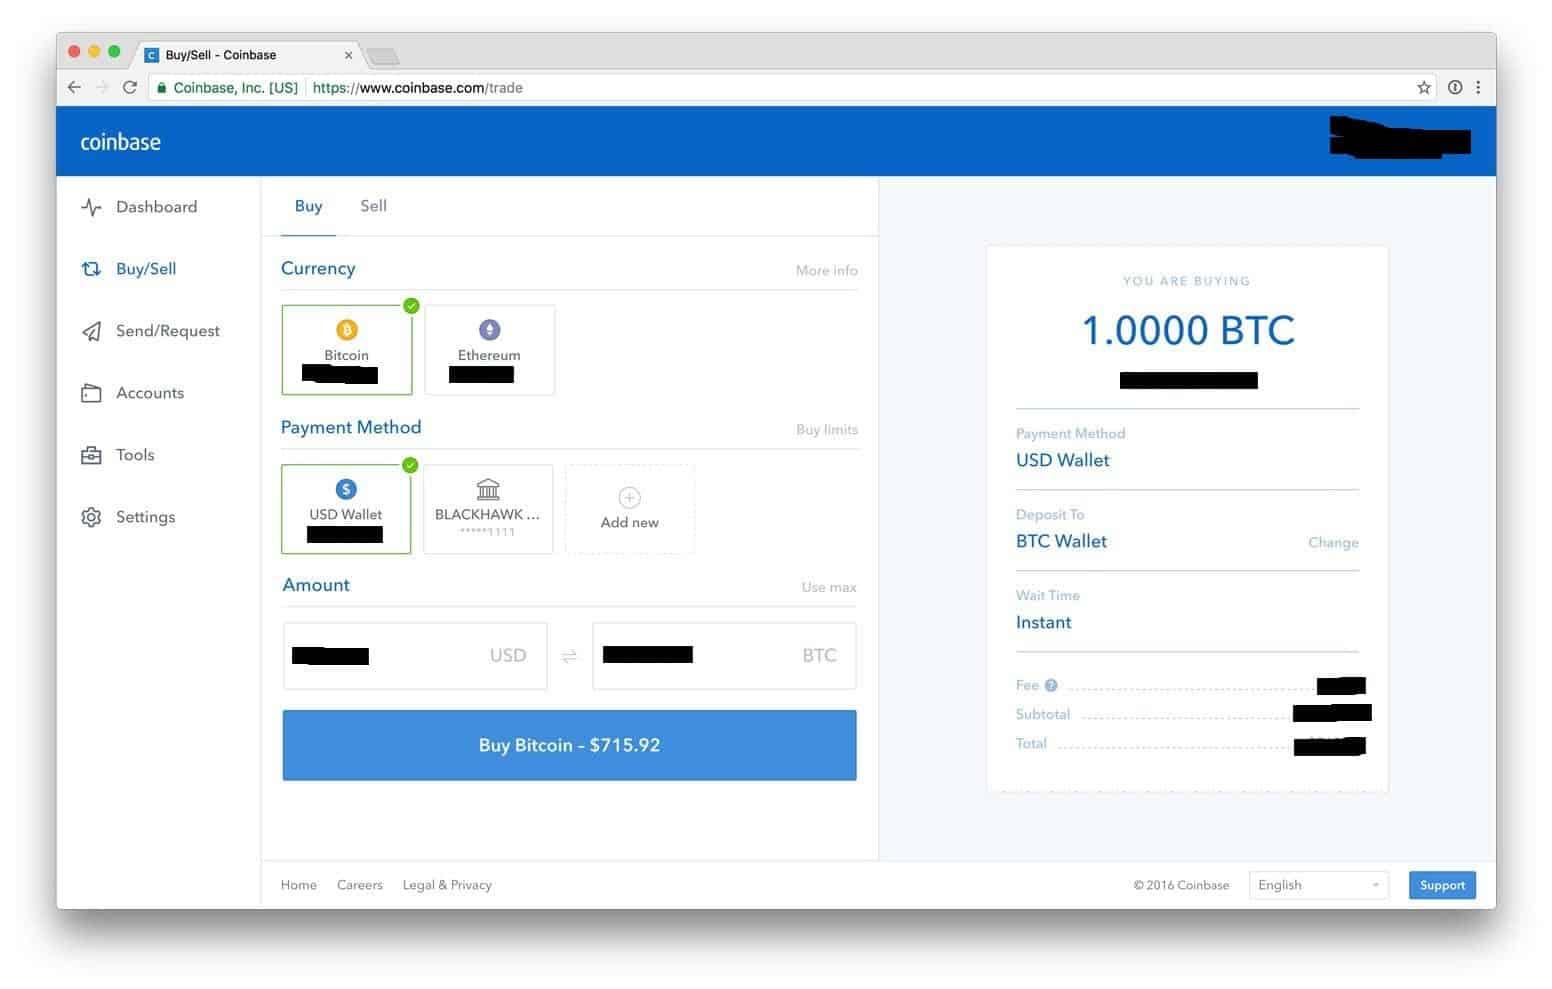 Coinbase Buy-Sell screen